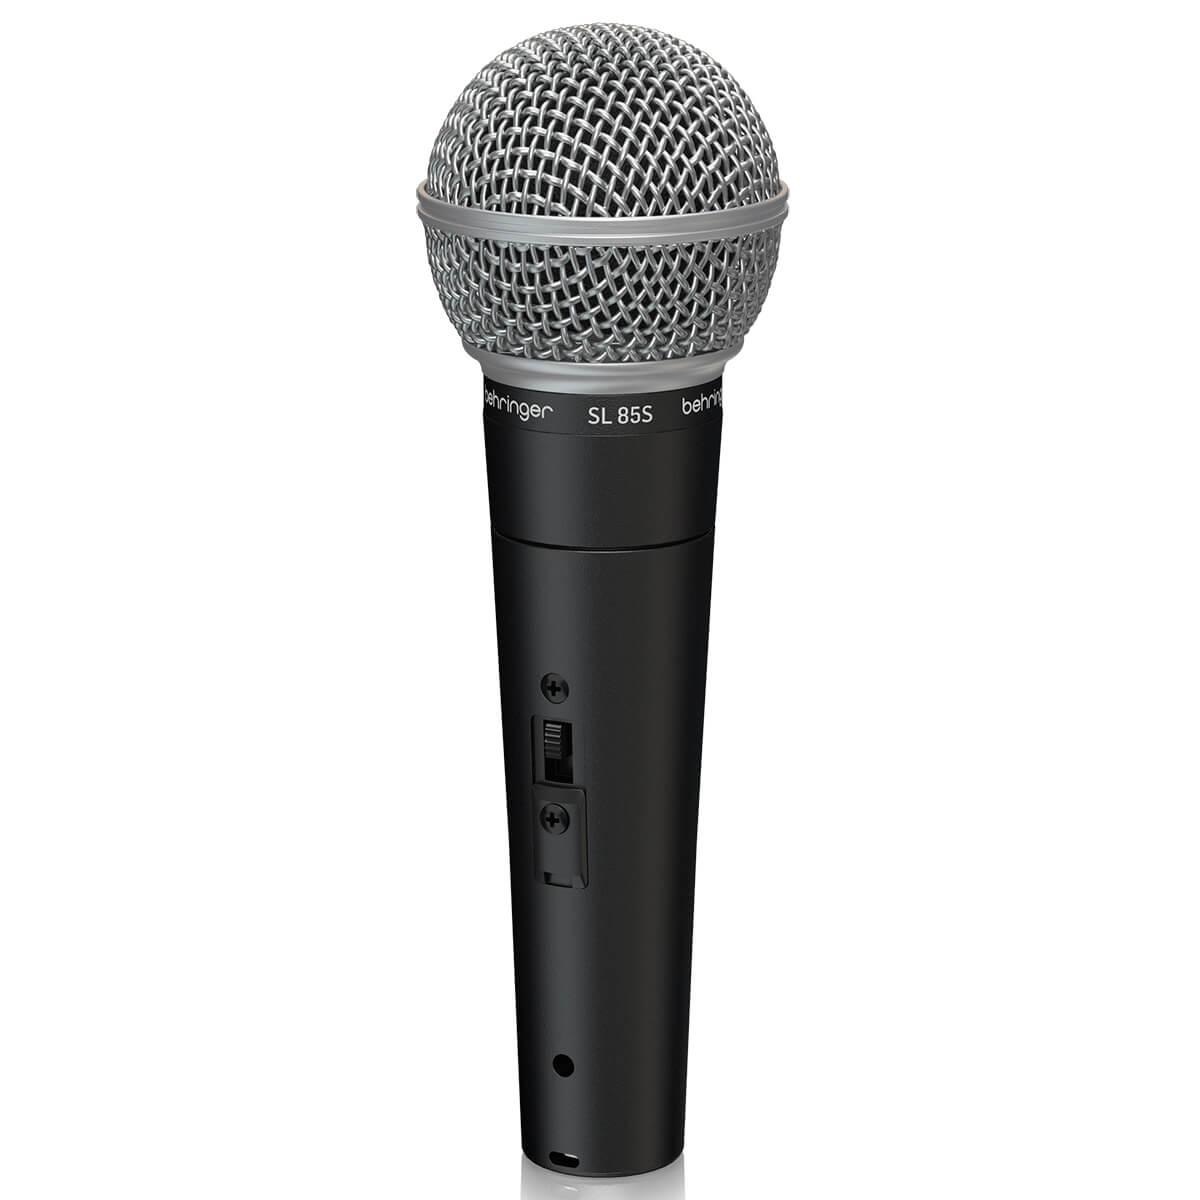 Microfone Dinâmico Behringer SL 85S com Interruptor